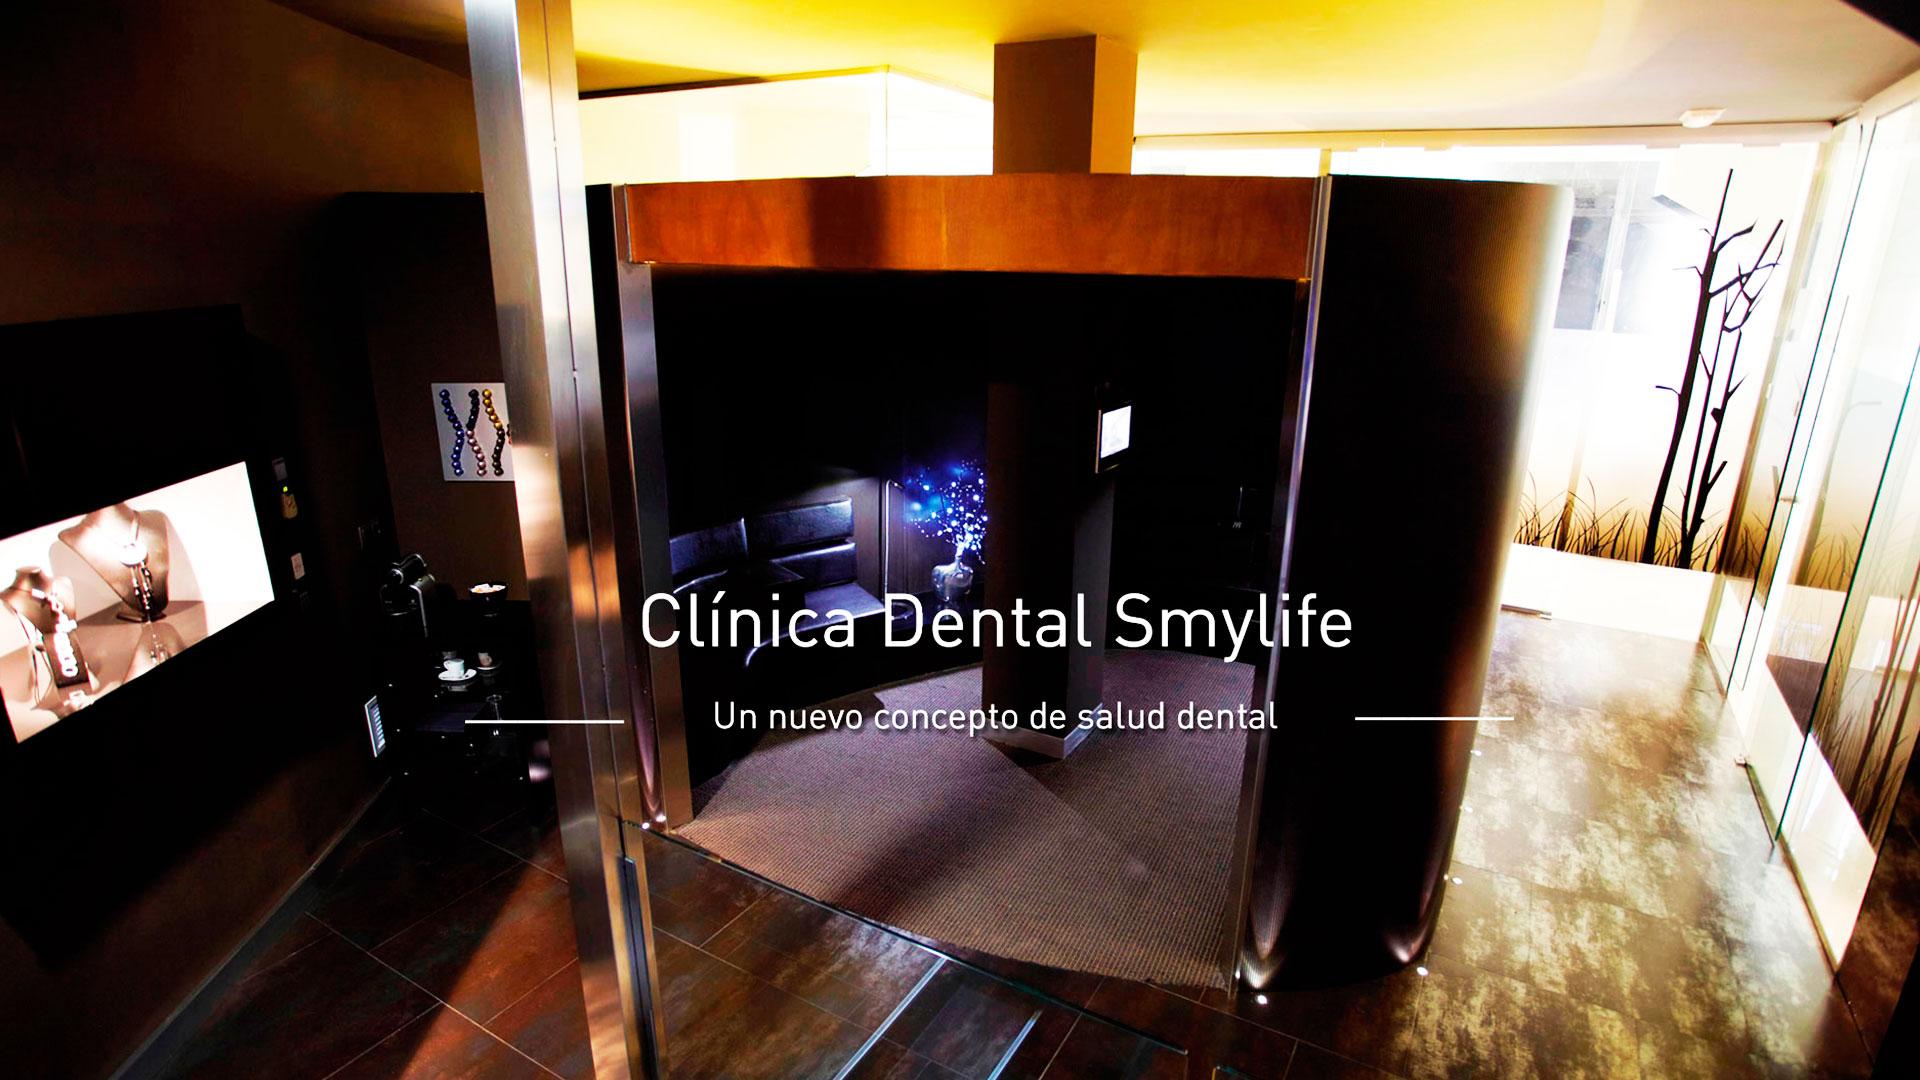 Odontología hero asset